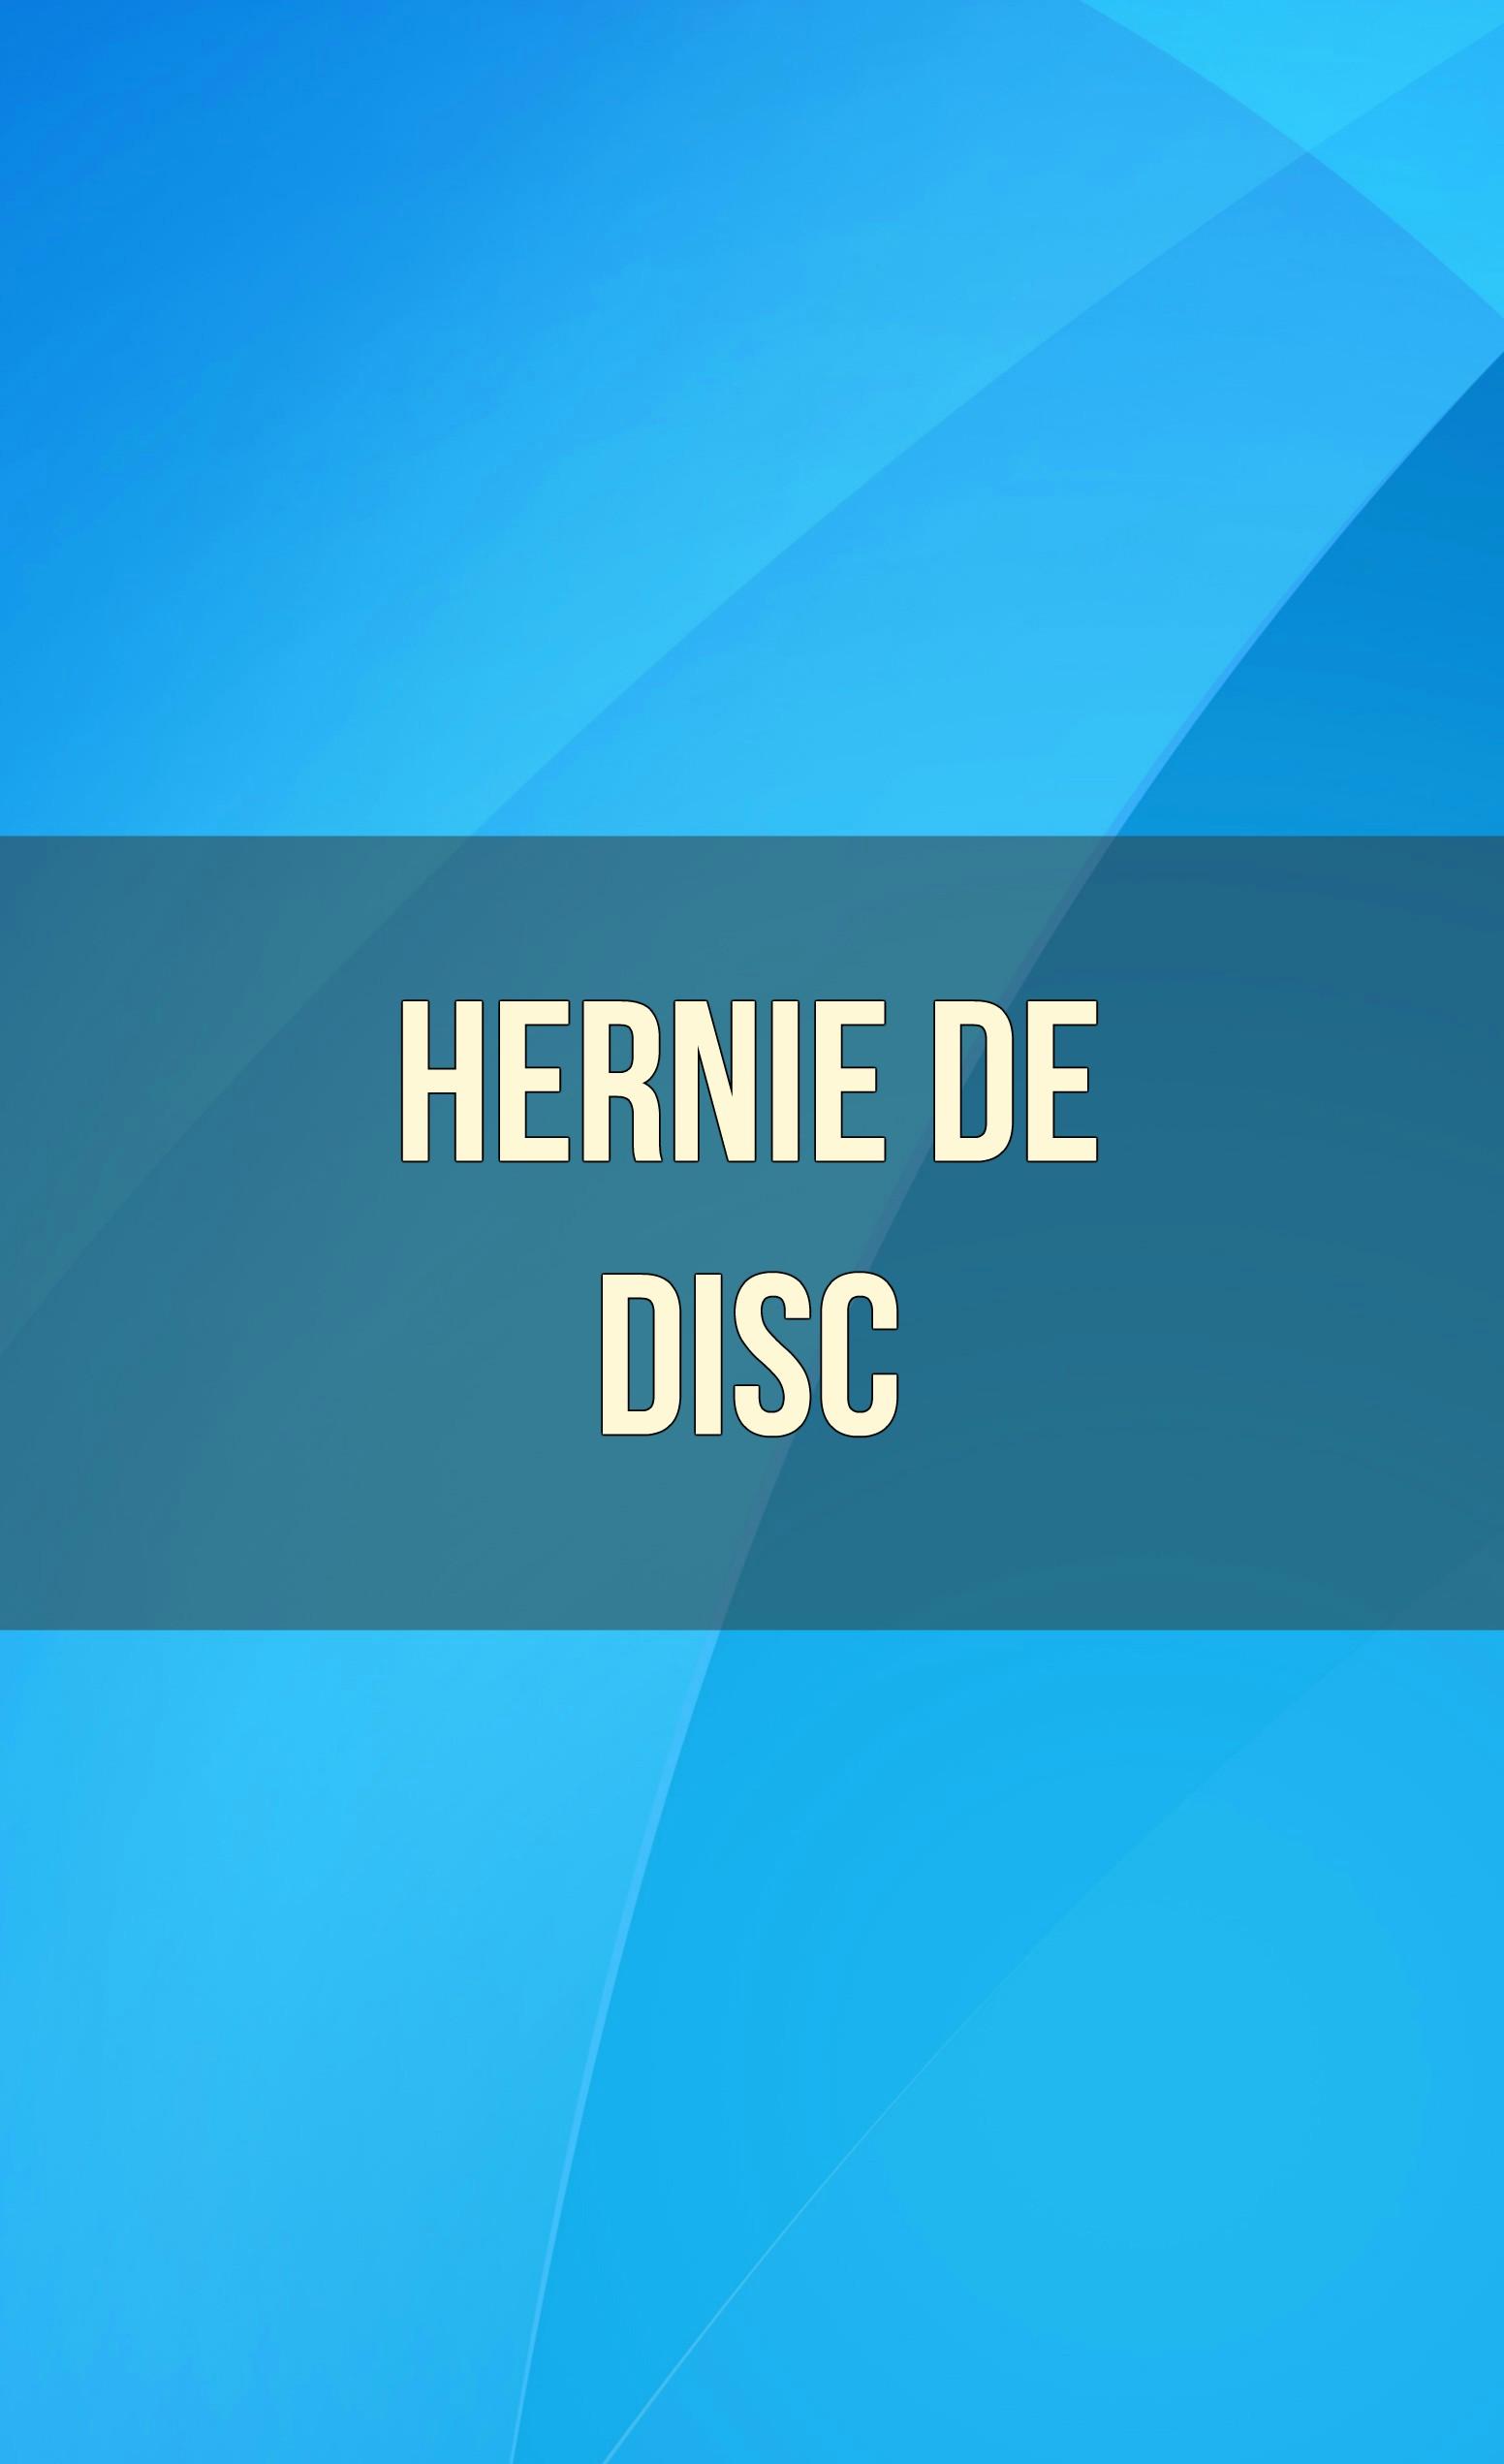 Hernie de disc